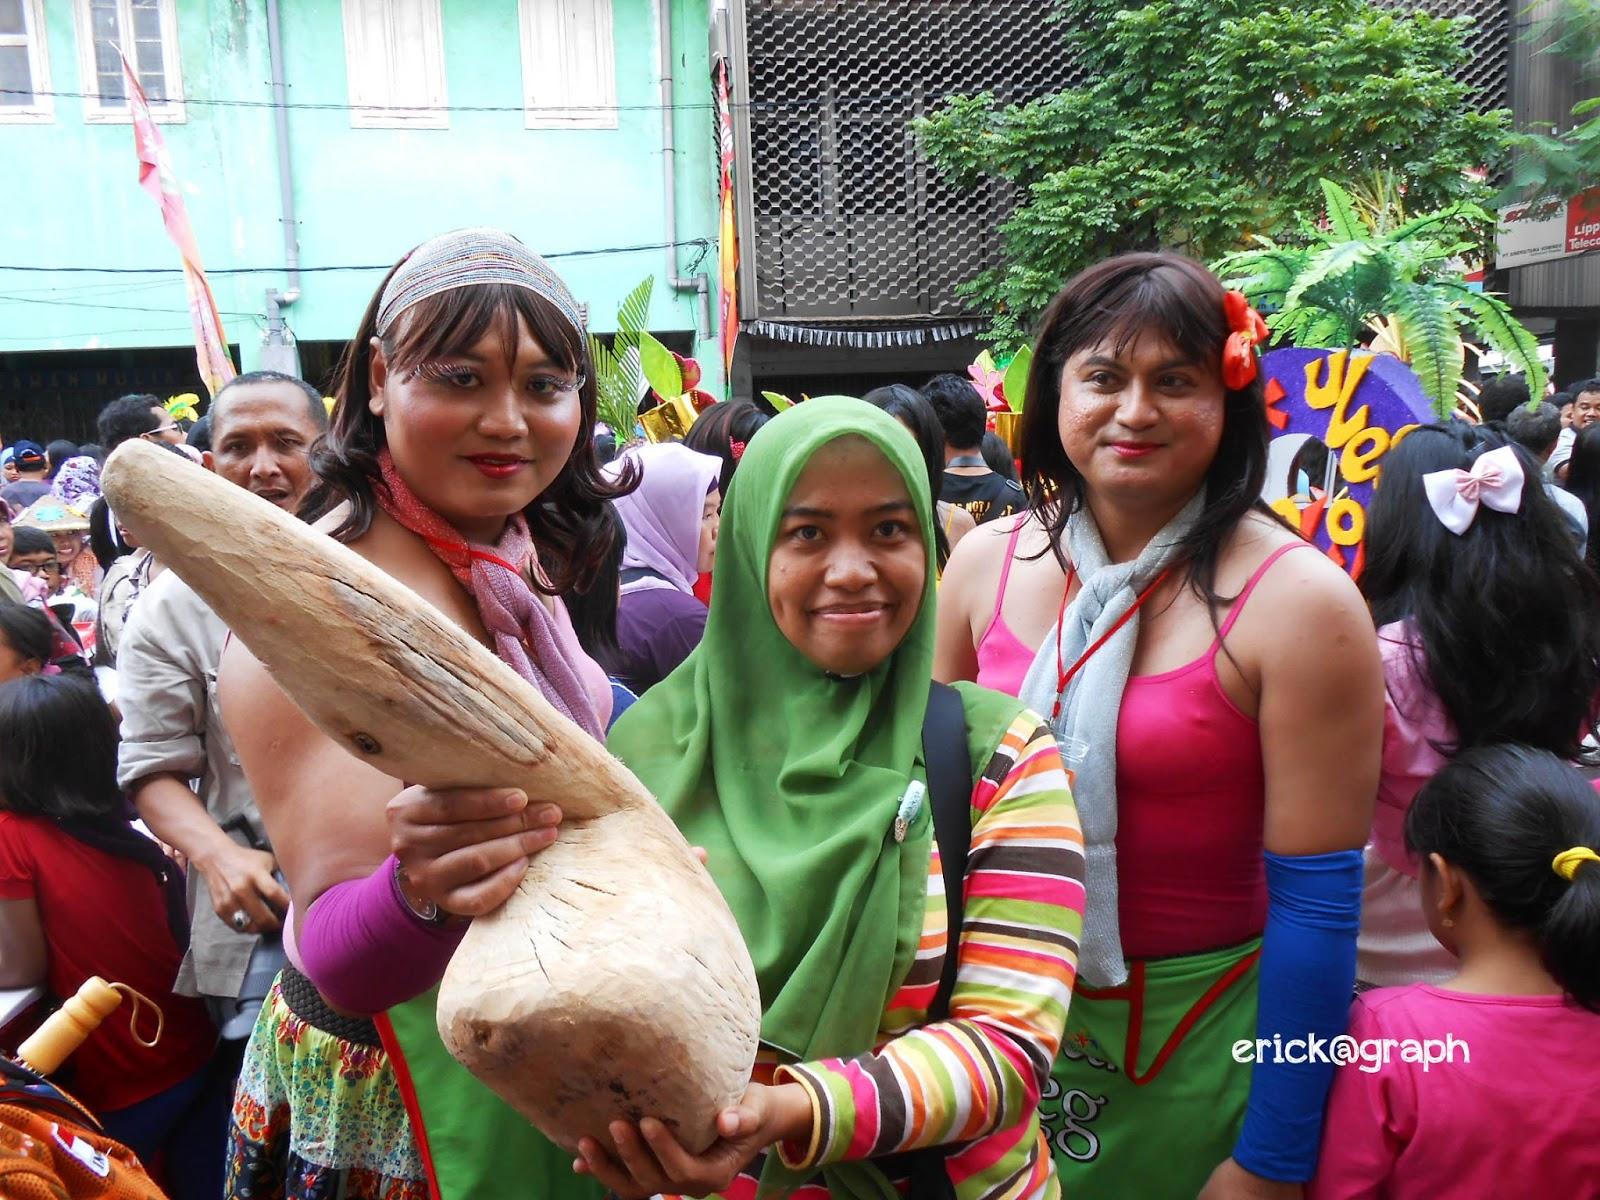 Festival Rujak Uleg Surabaya - Kembang Jepun